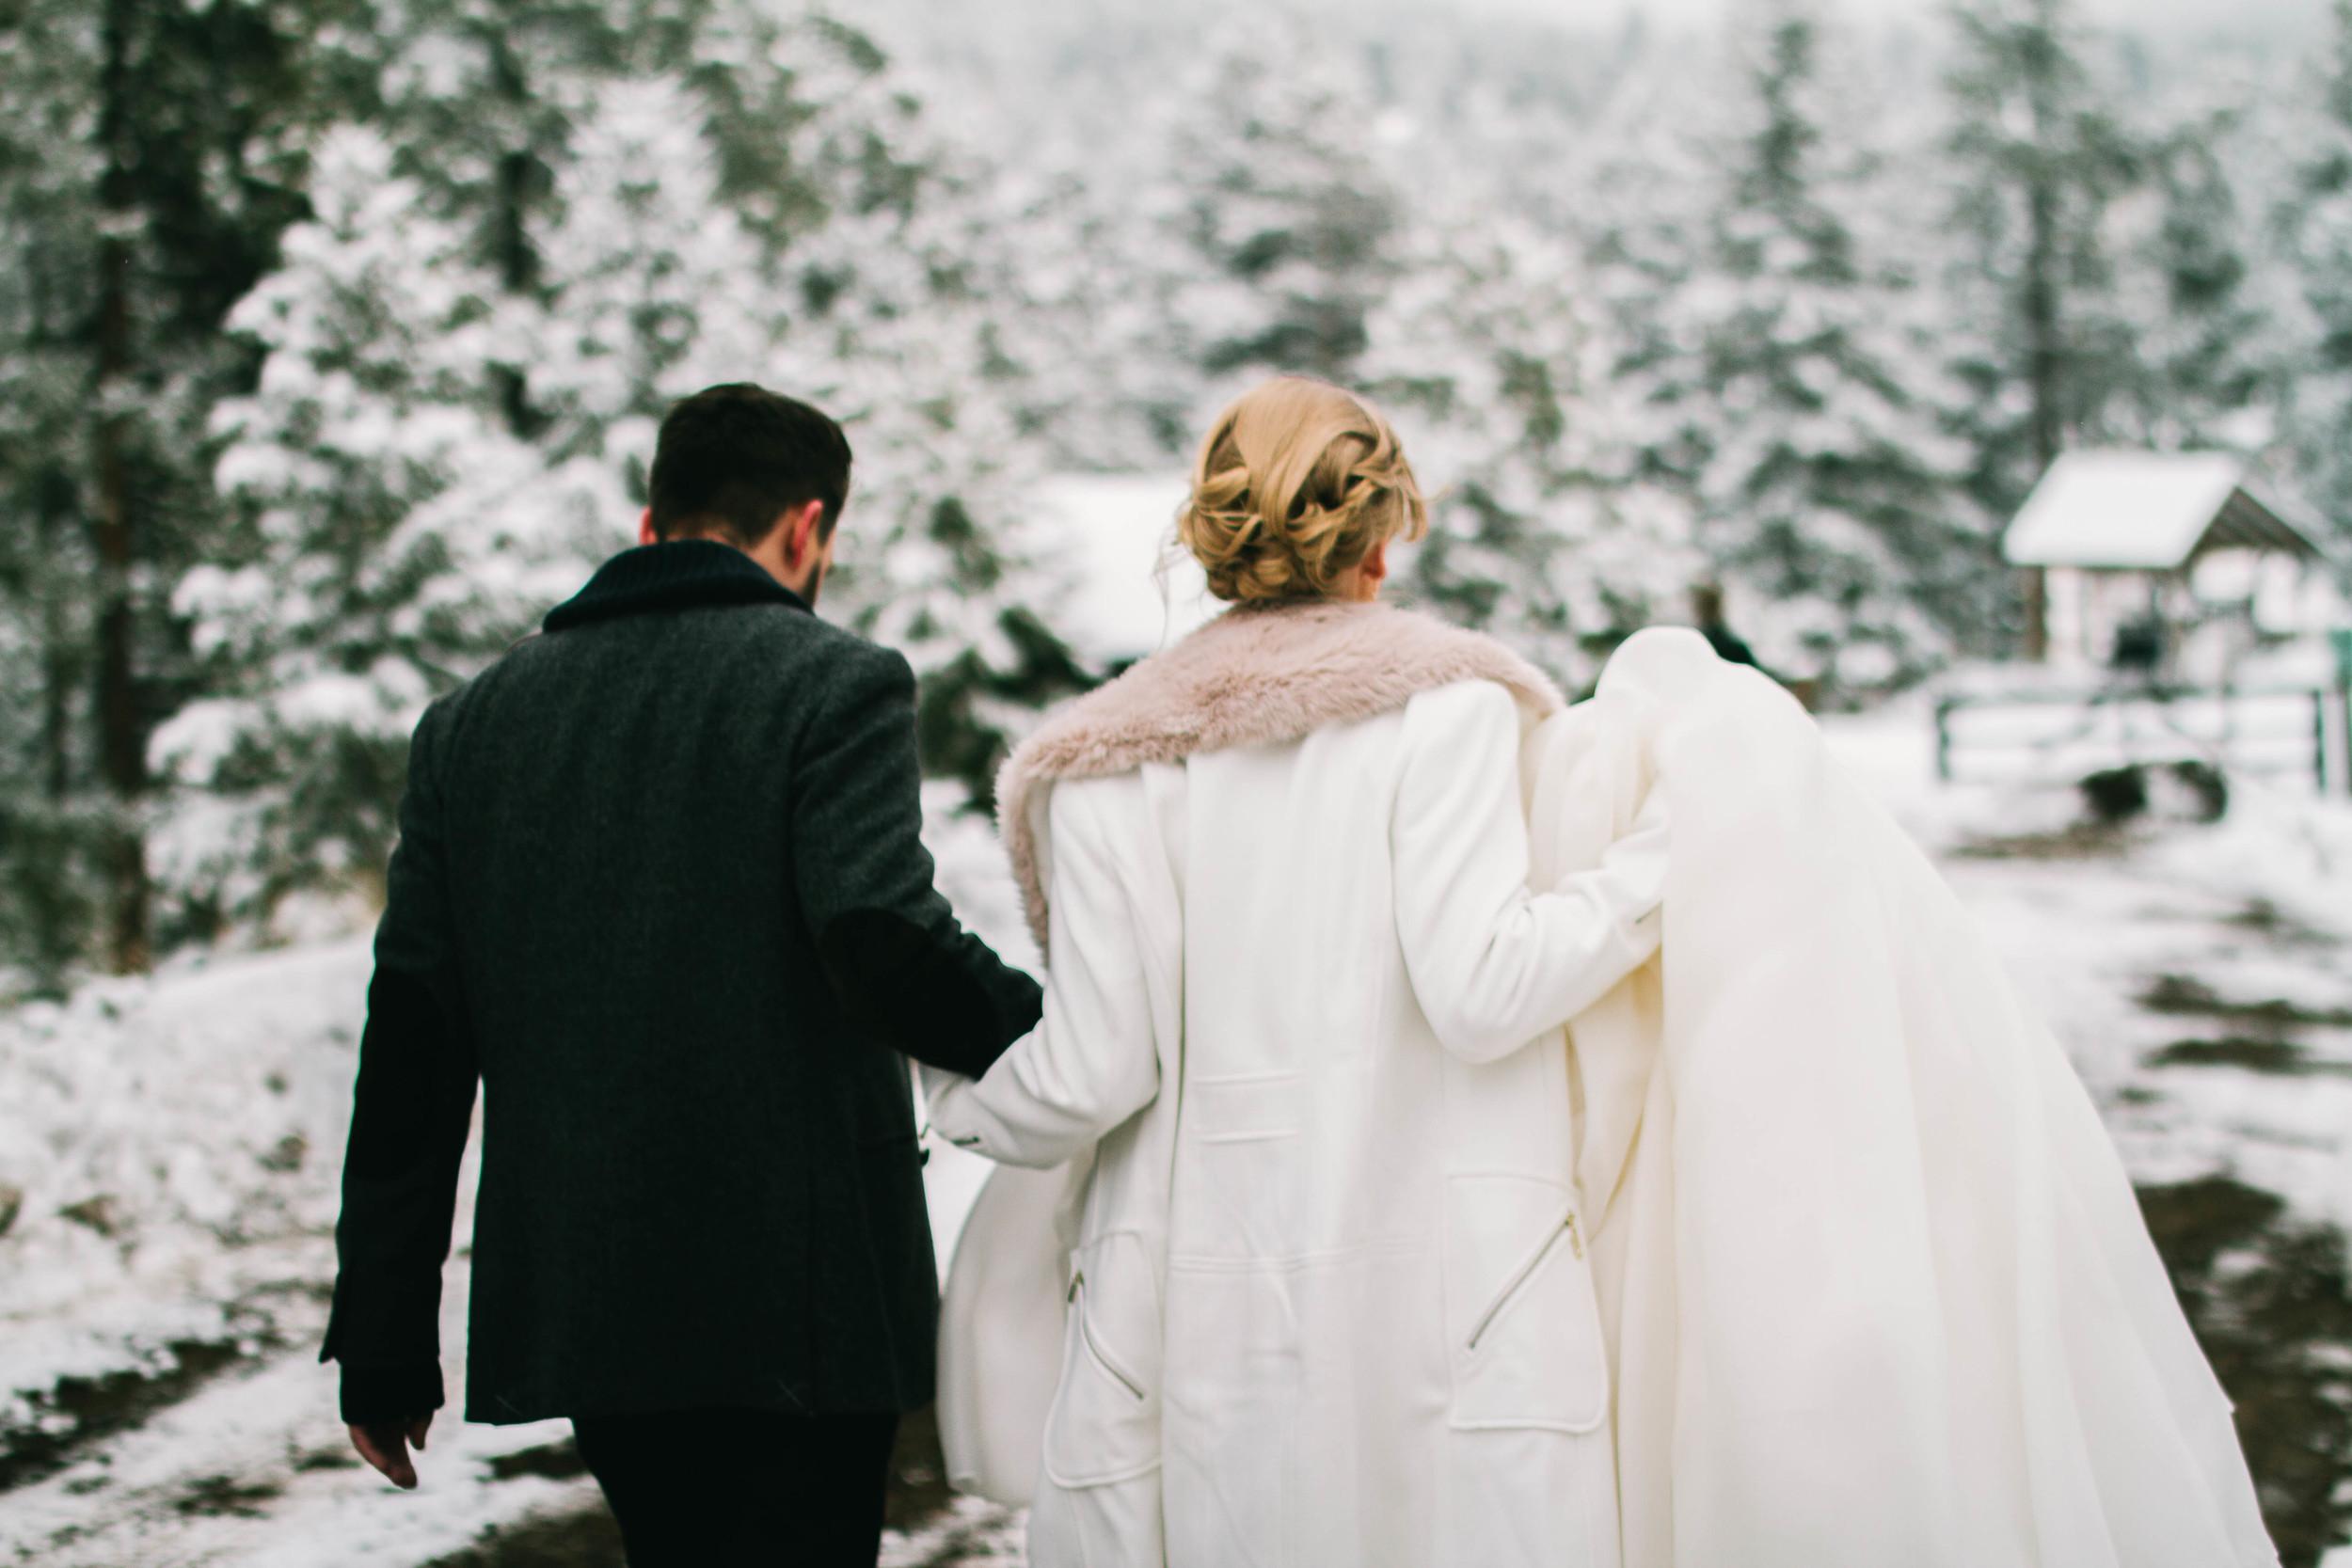 Bonin Wedding - Madeleine Bonin Photography-5843.jpg